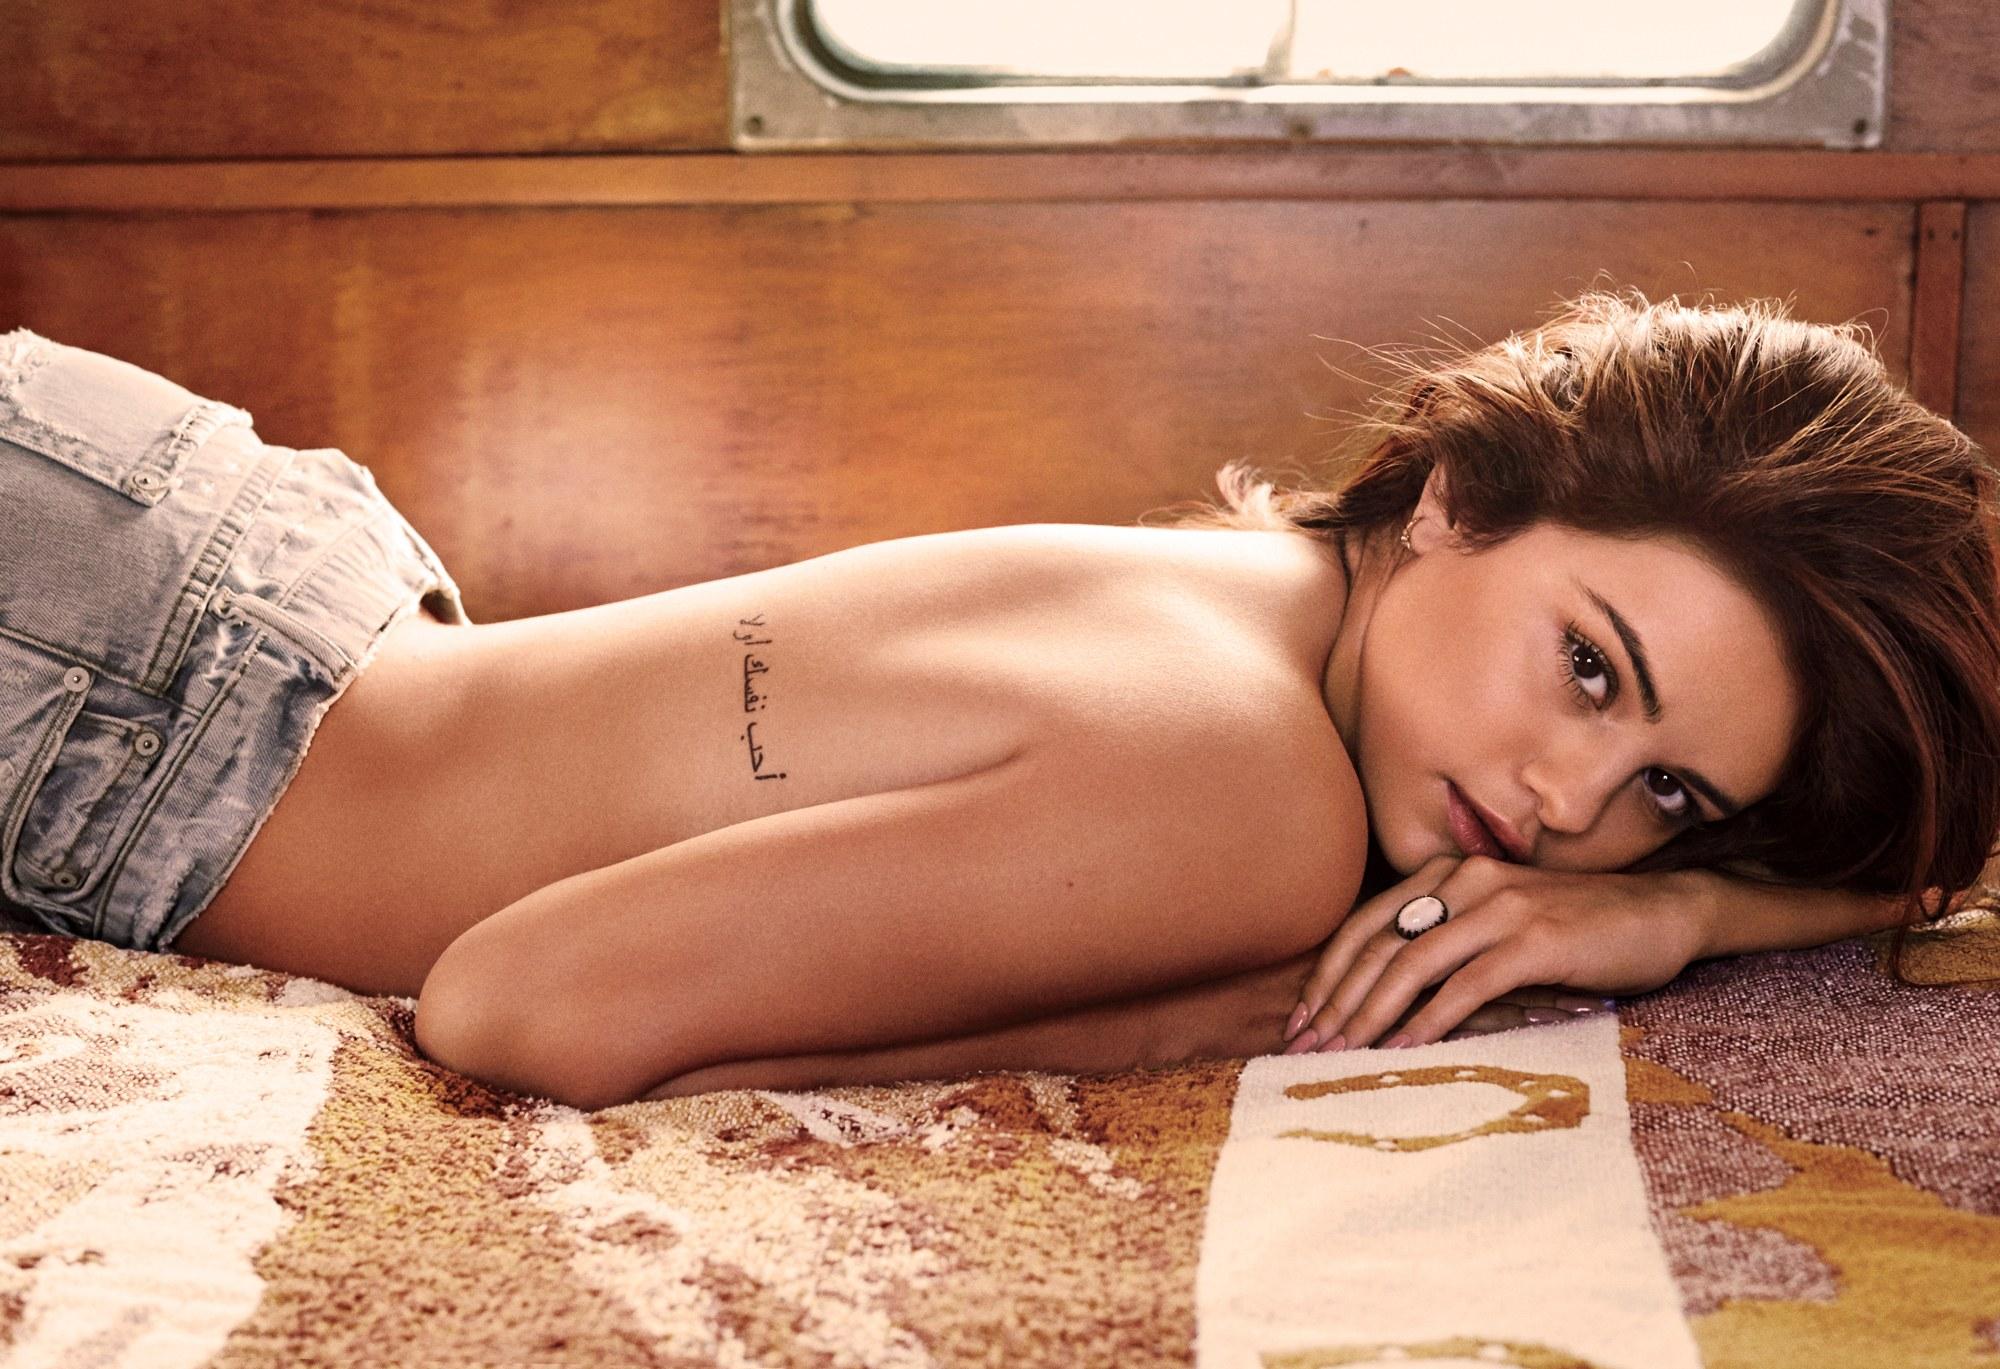 Foto Selena Gomez Topless & Pamer Tato di Majalah GQ